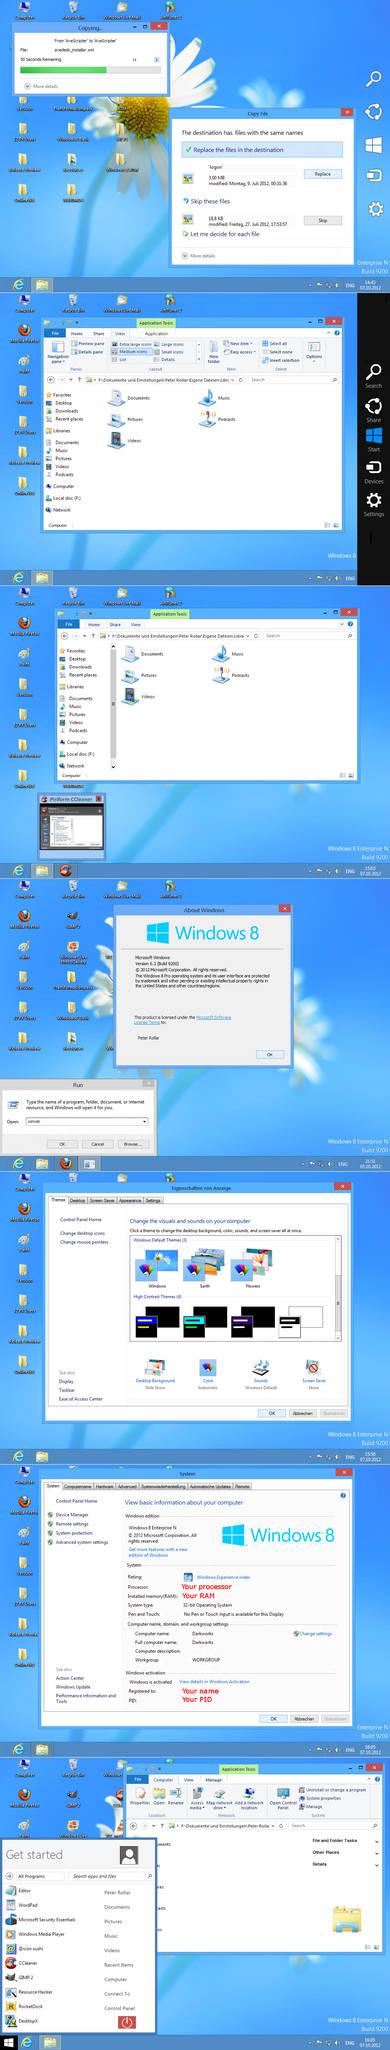 Windows 8 RTM Build 9200